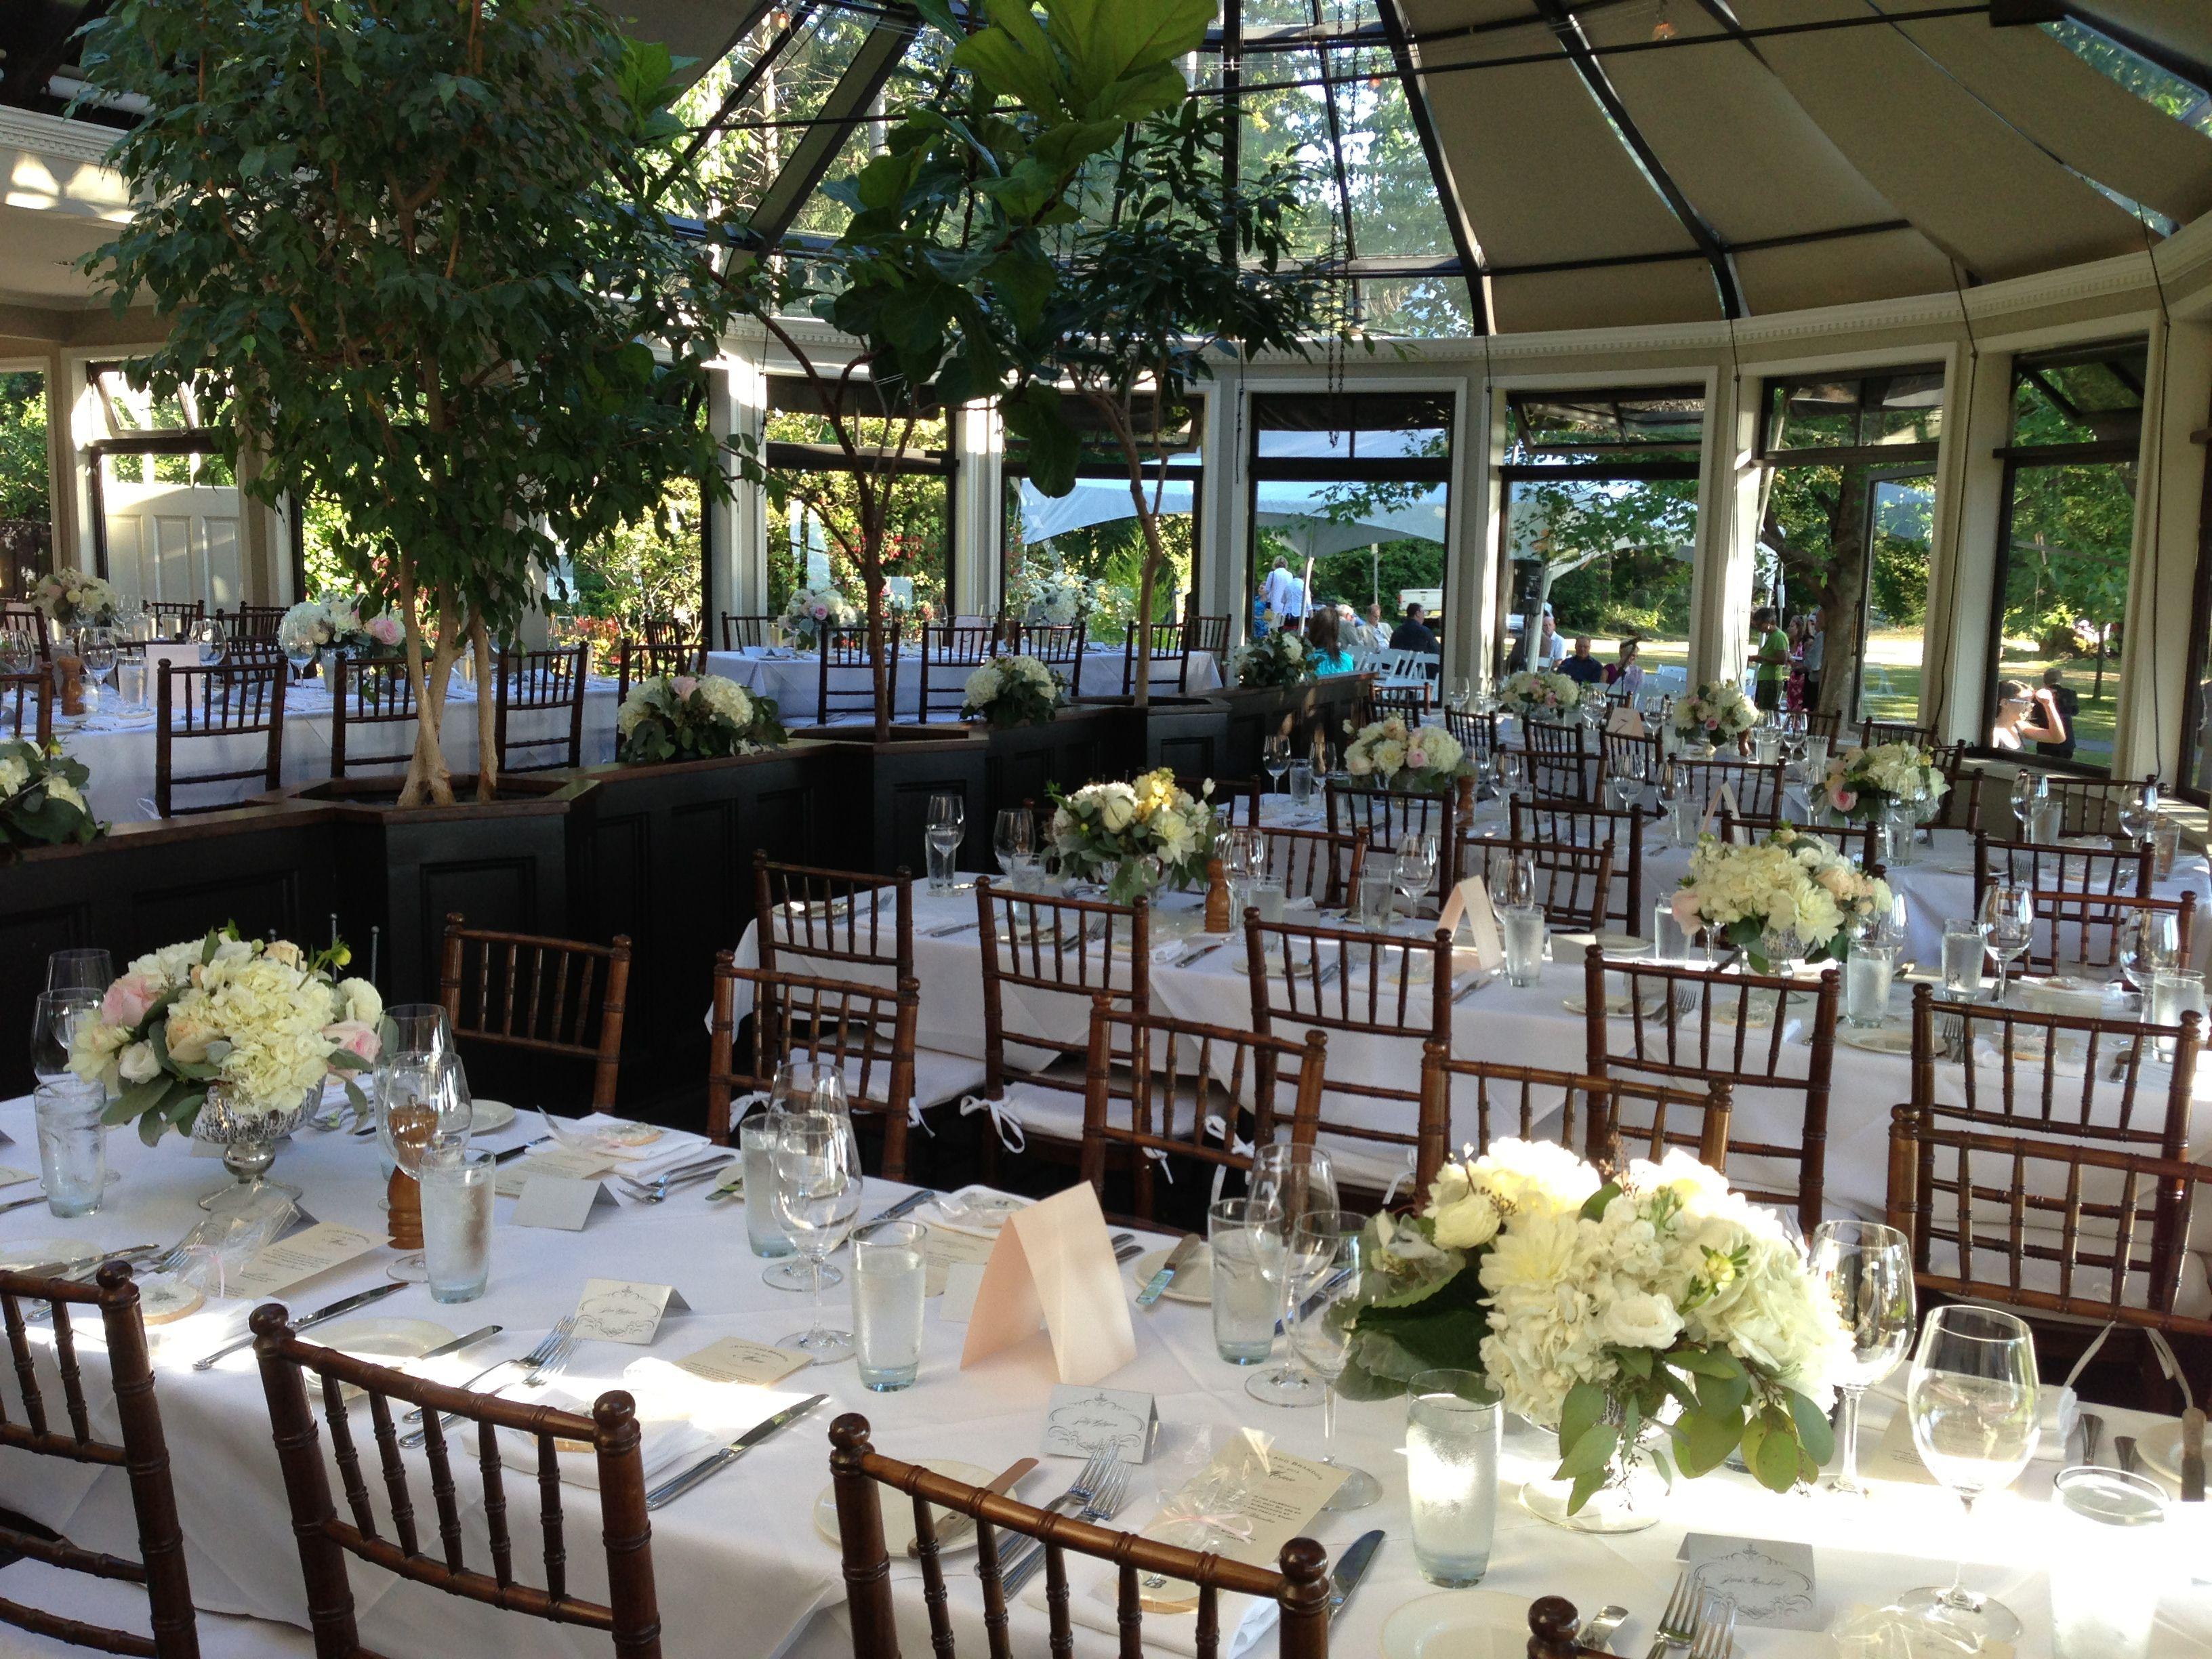 Stanley Park Teahouse Wedding VancouverWedding ColoursWedding VenuesWedding